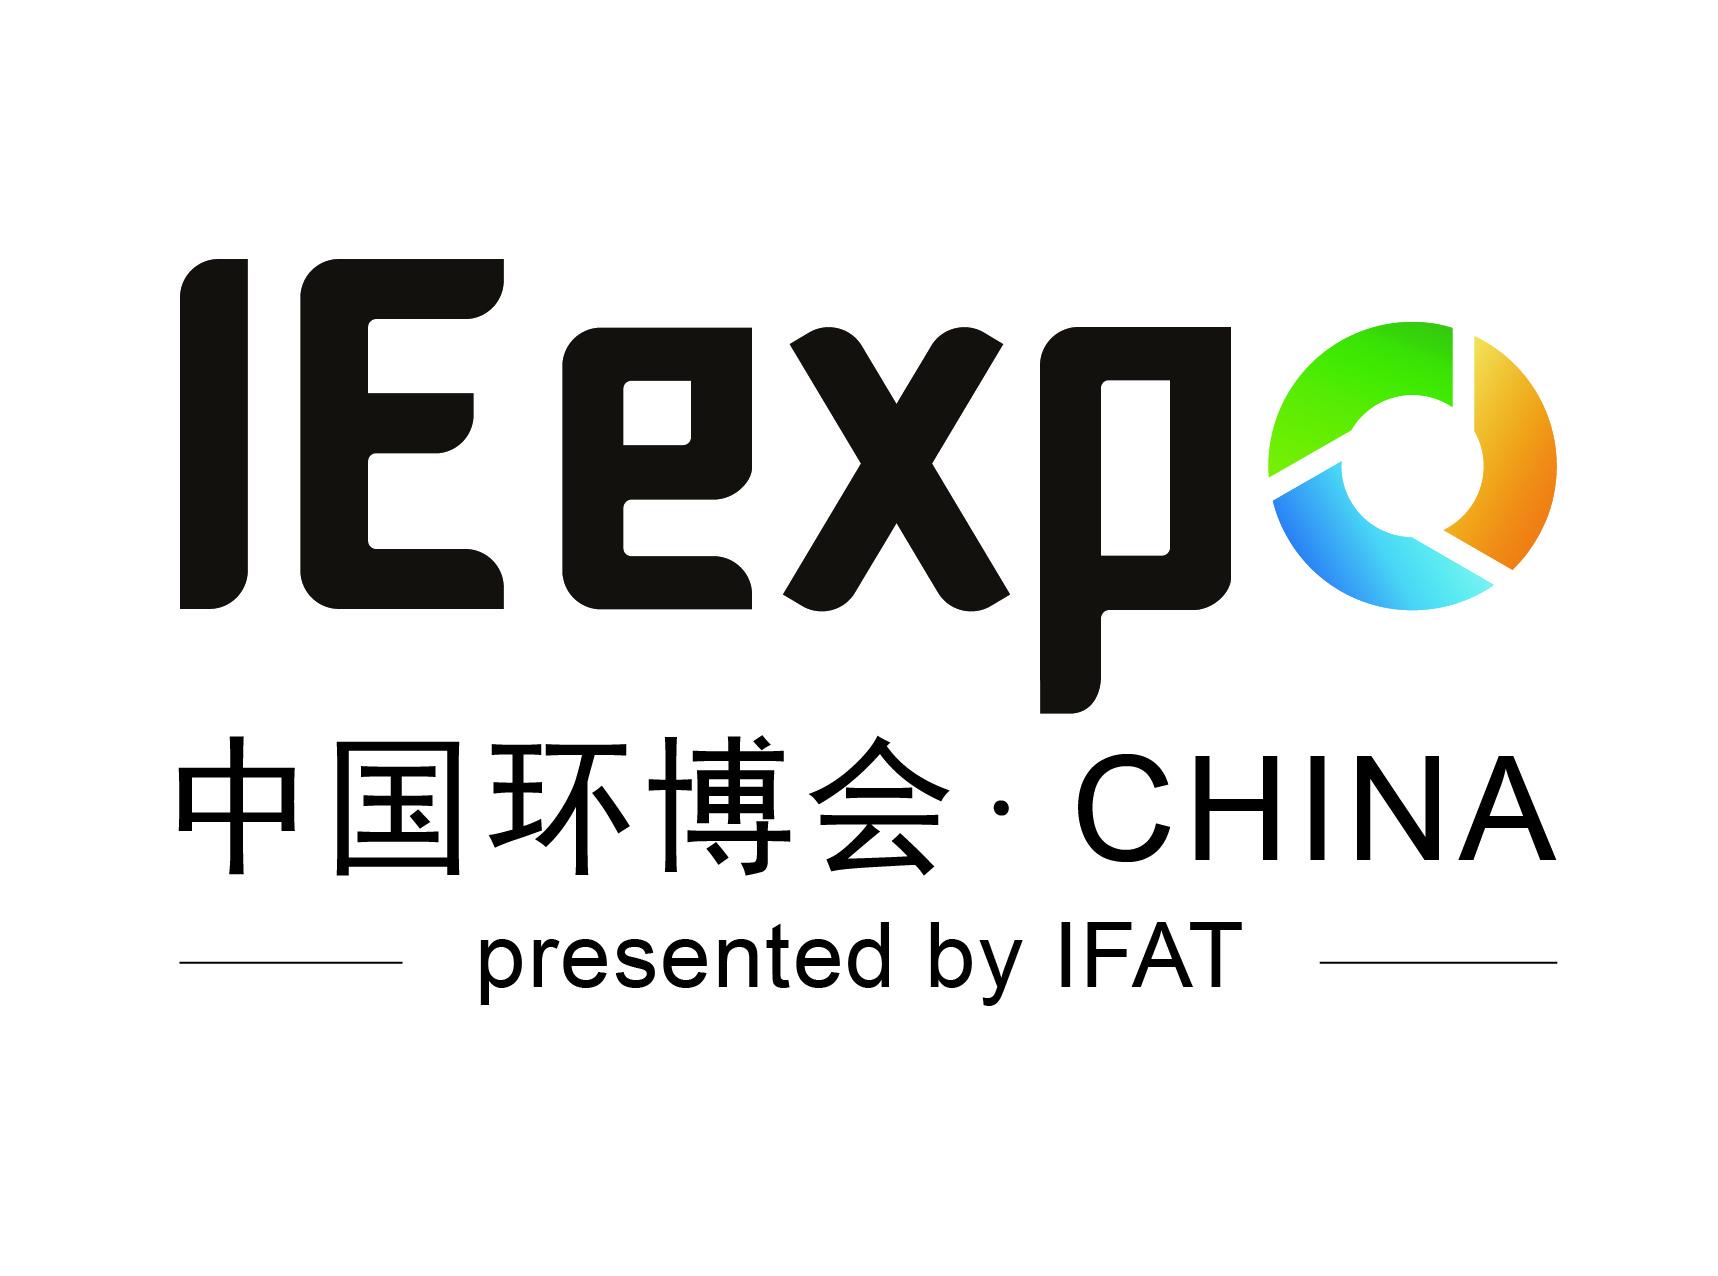 ie_expo_logo_for_shanghai_20171